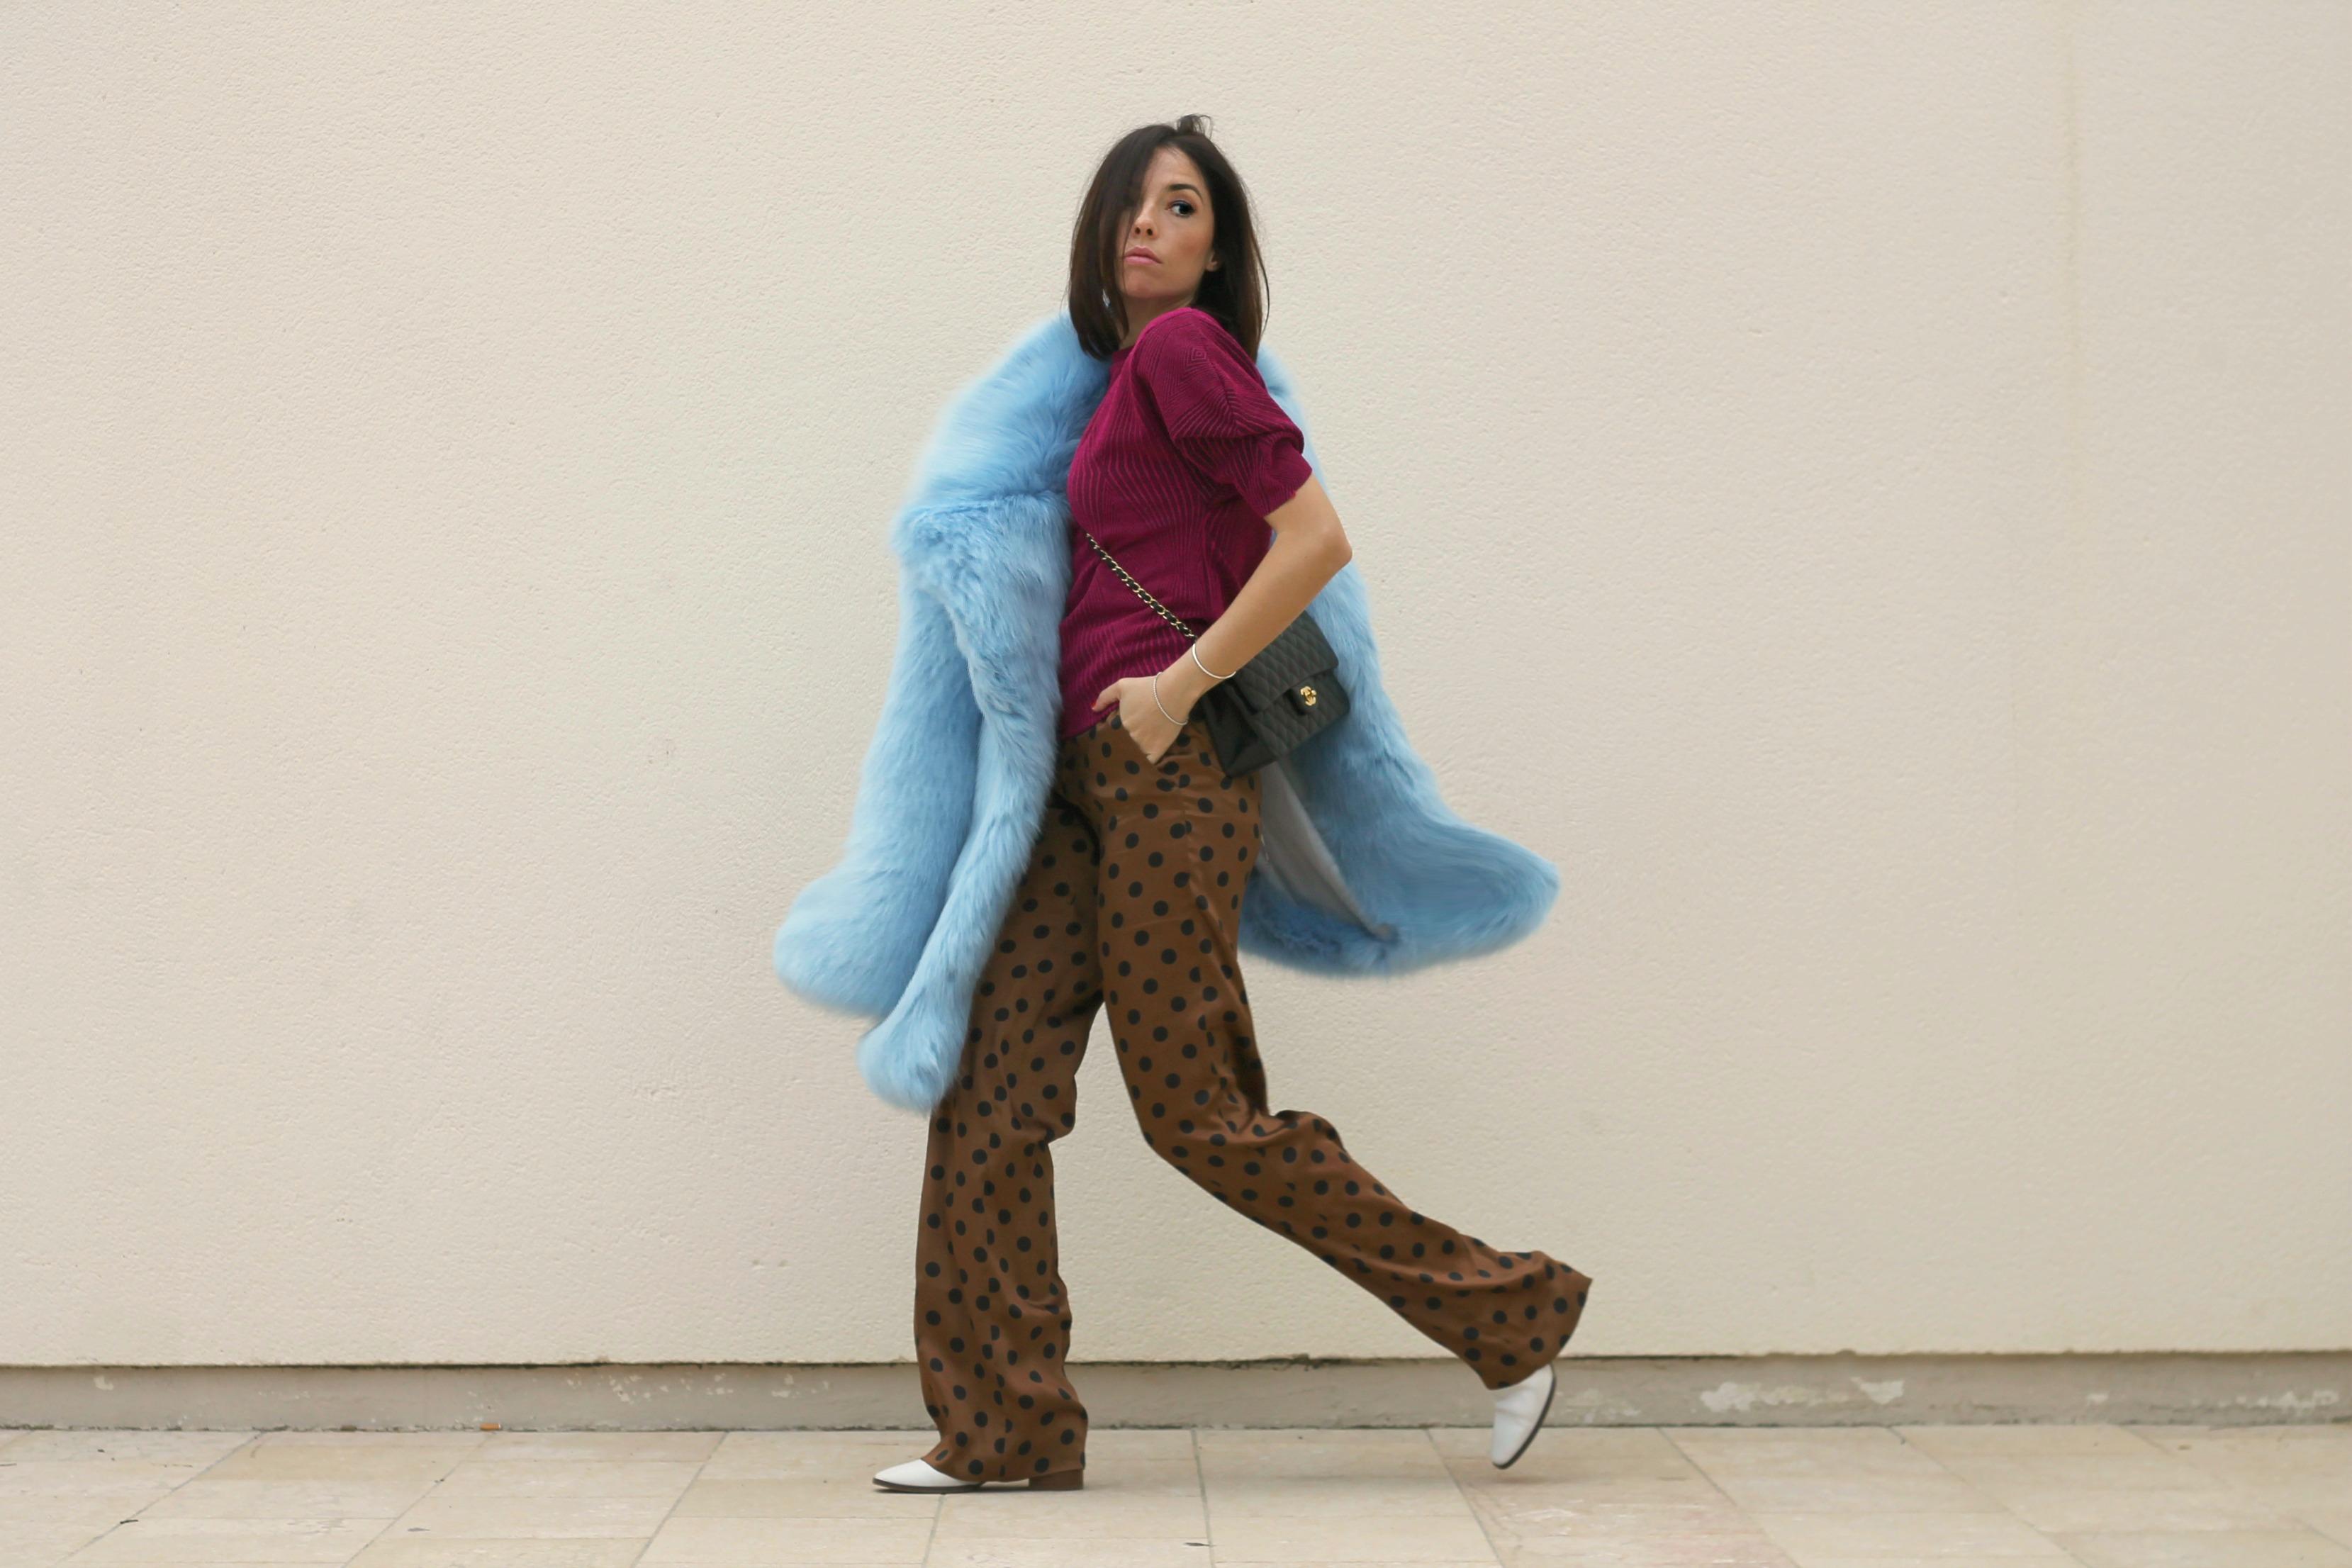 lotta volkova, lotta volkova stylist, lotta volkova editorial, fashion editorial lotta volkova, elisa bellino, blogger moda italia, pantaloni pois, come abbinare pantaloni a pois, theladycracy.it,